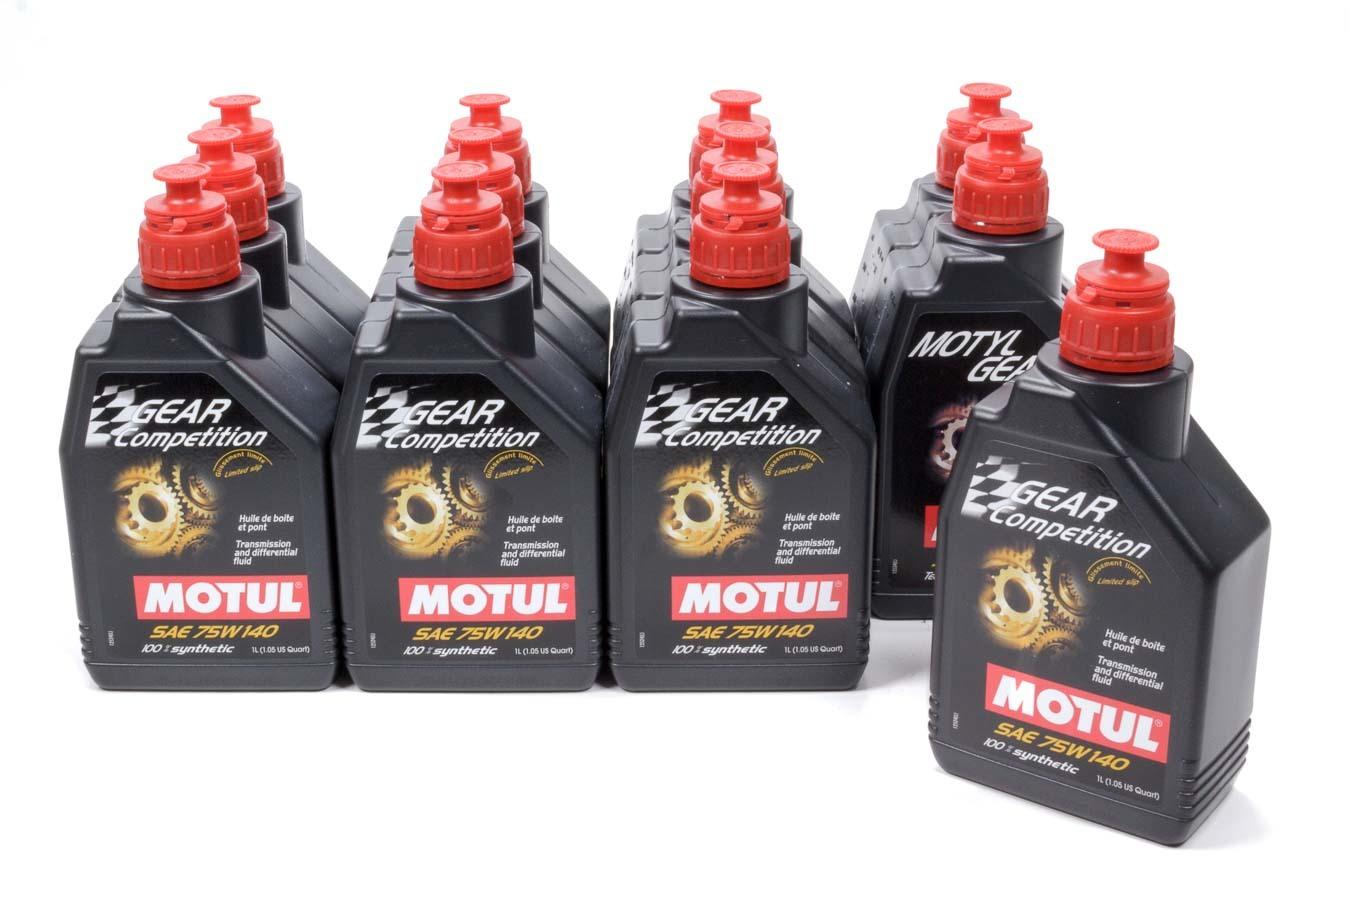 Motul Usa Gear Comp 75w140 Oil Case/12-Liter